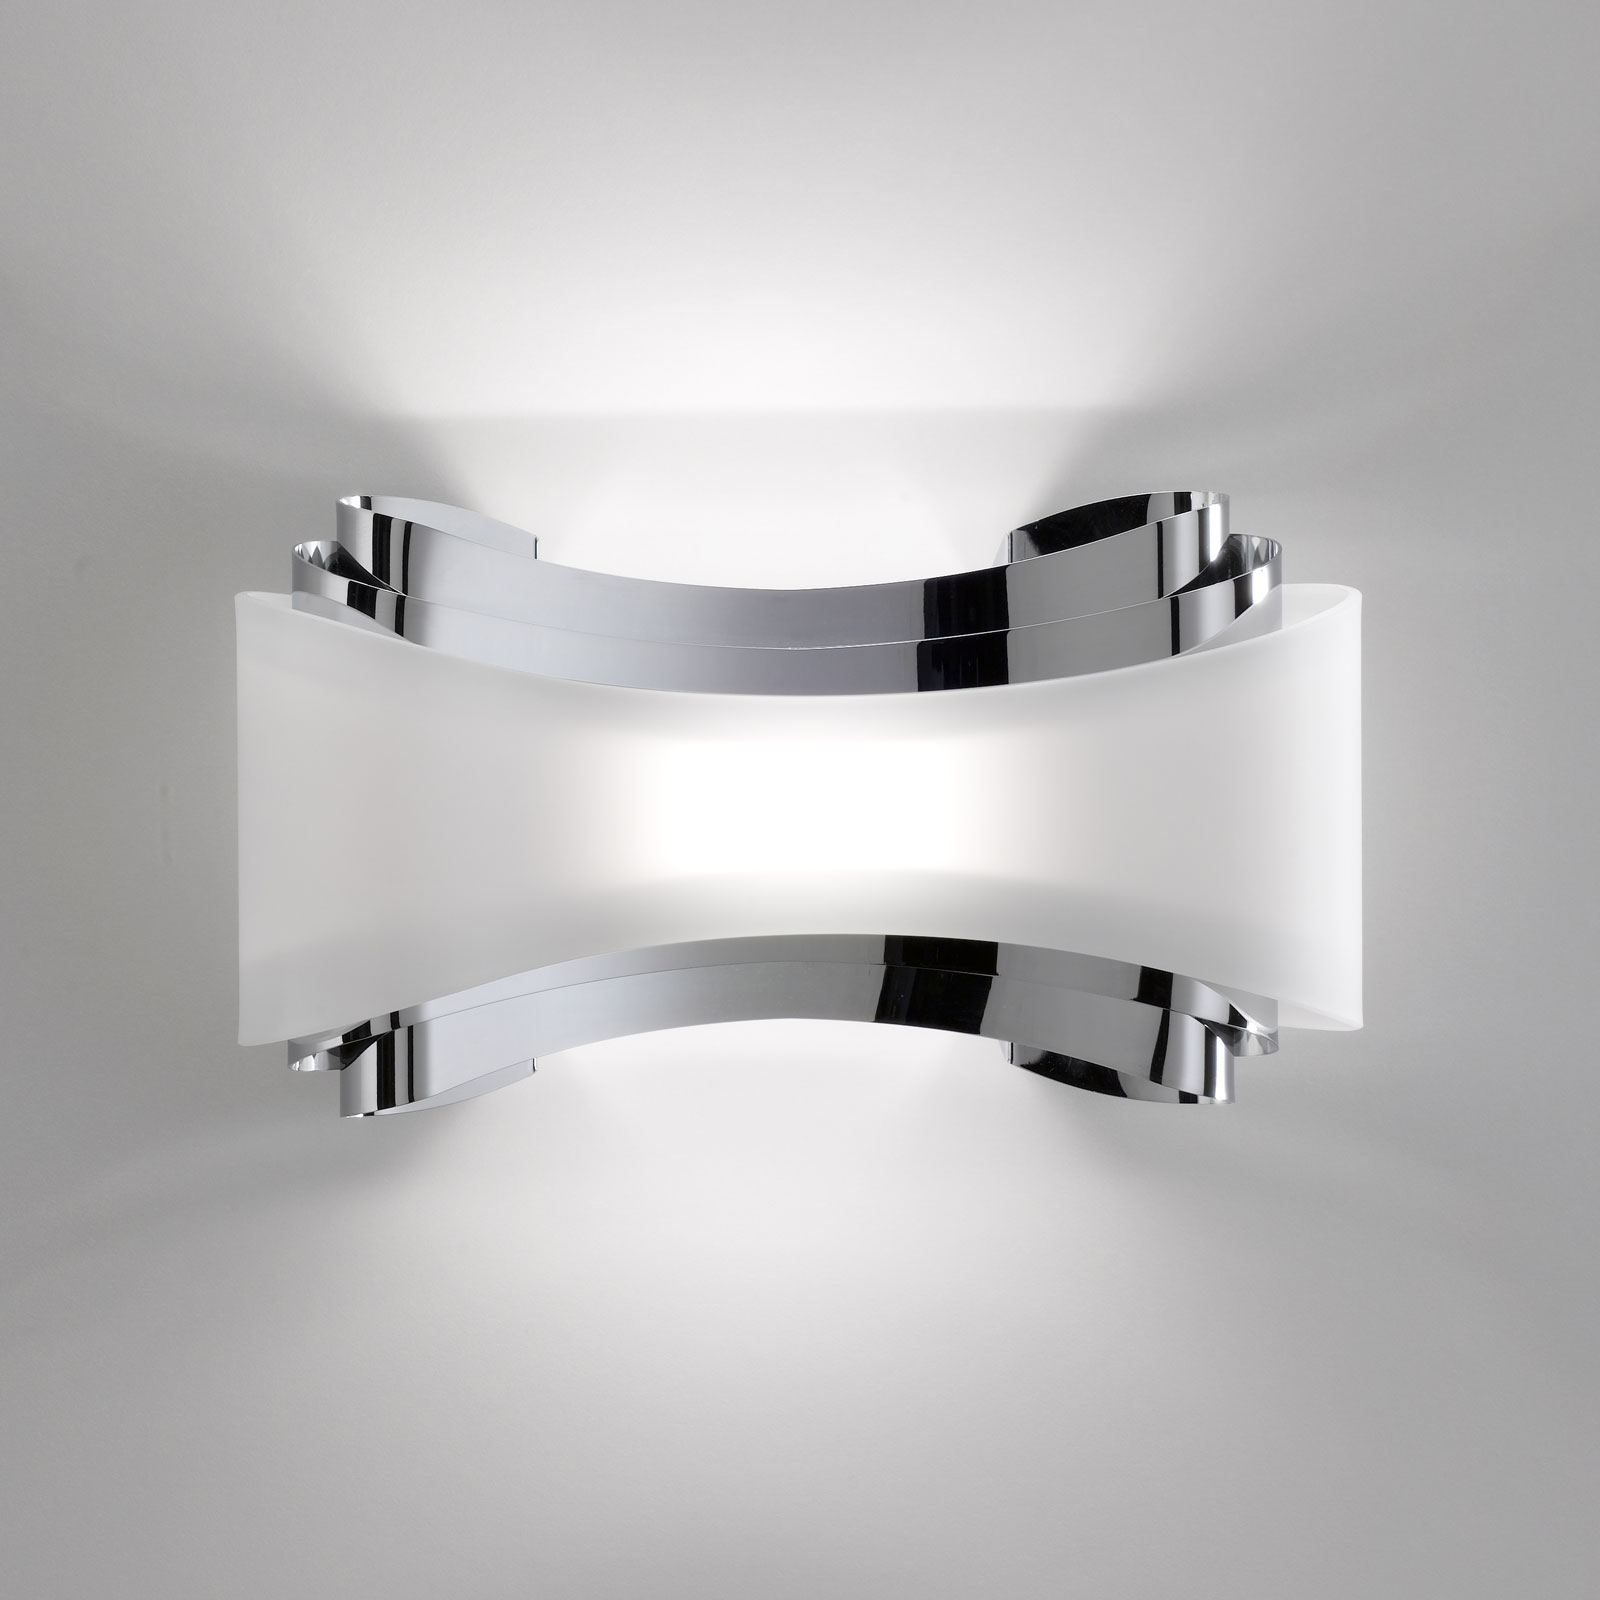 LED wandlamp Ionica met glazen plaat, chroom